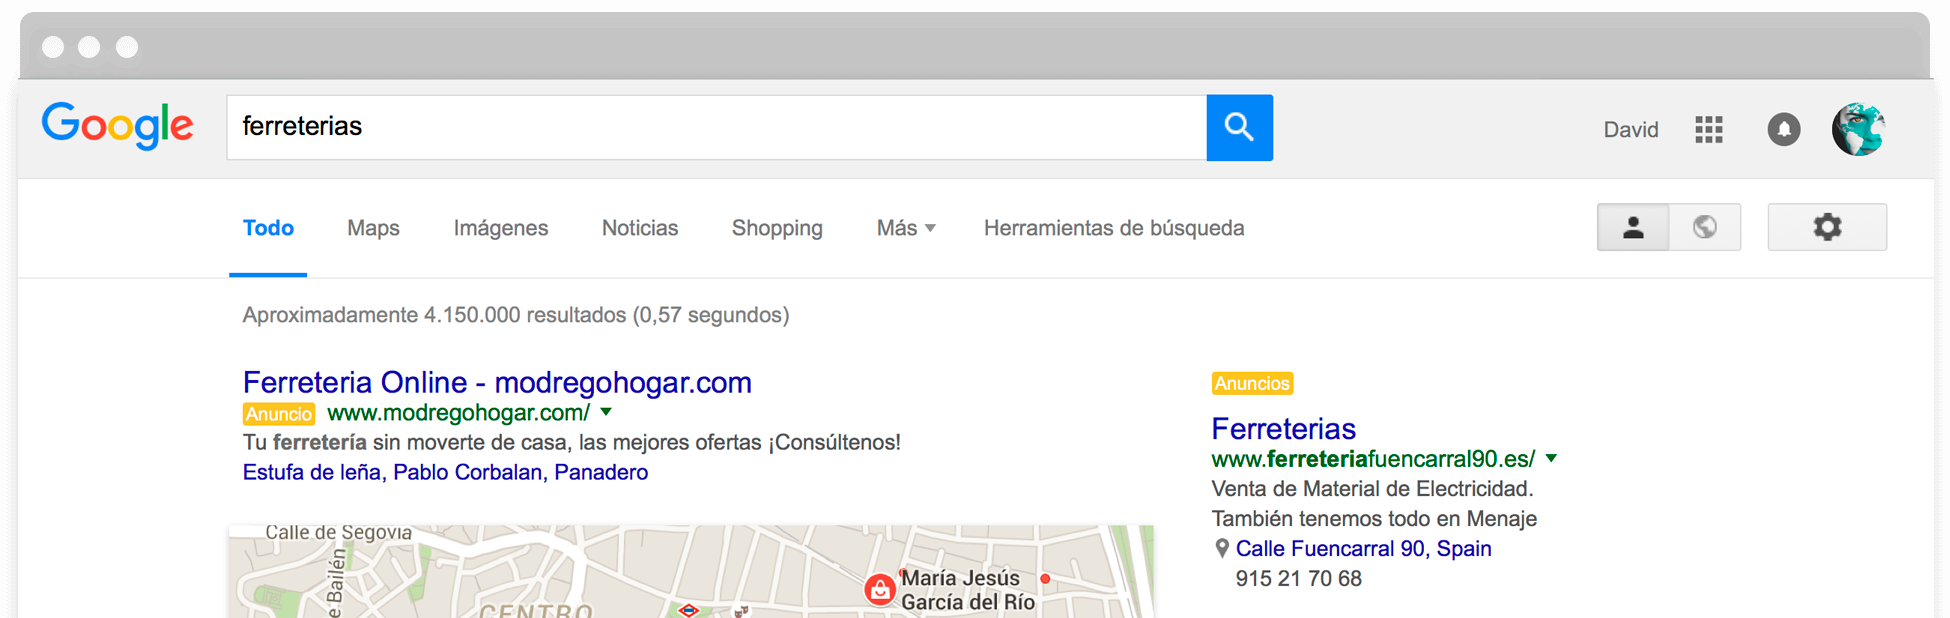 SEM SEO Google Adwords Posicionamiento